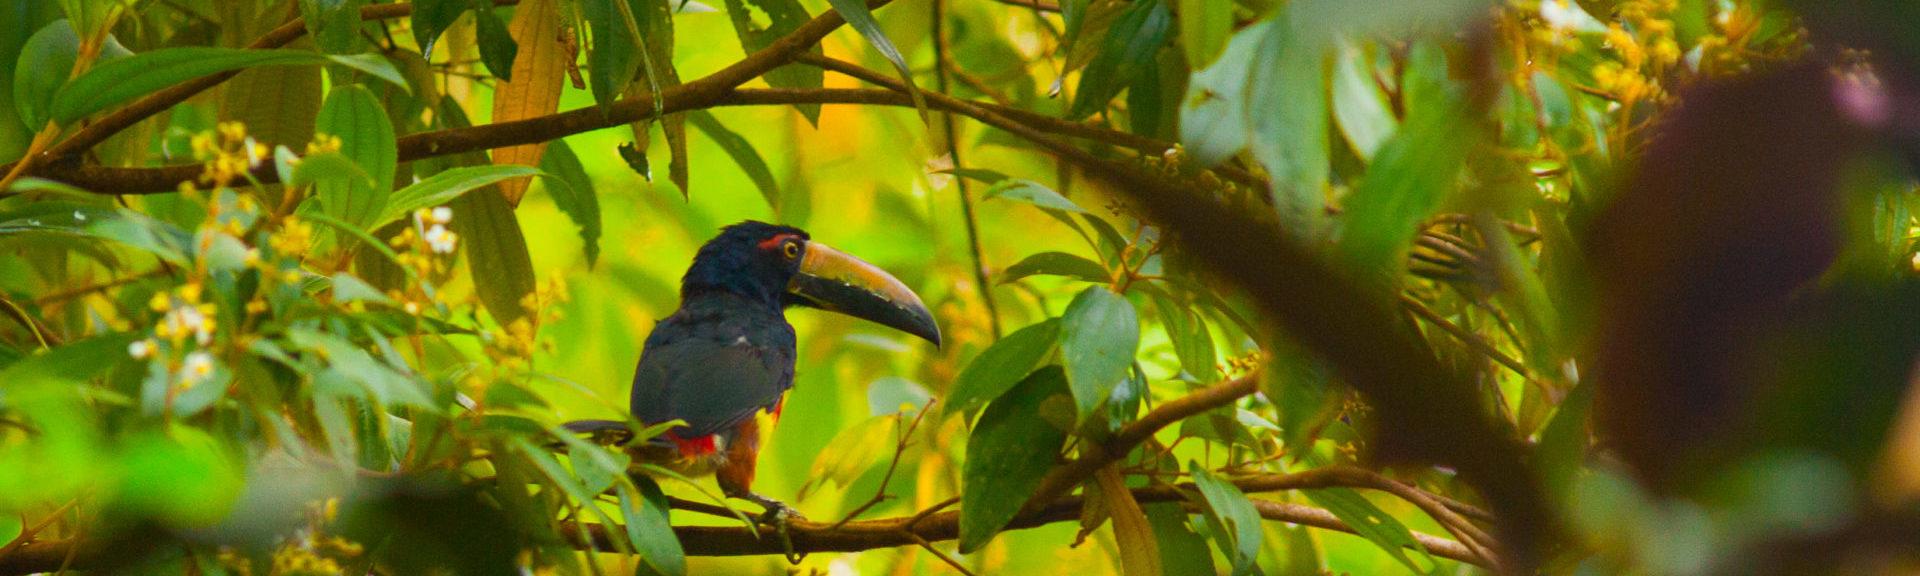 Reizen op maat Costa Rica aracari